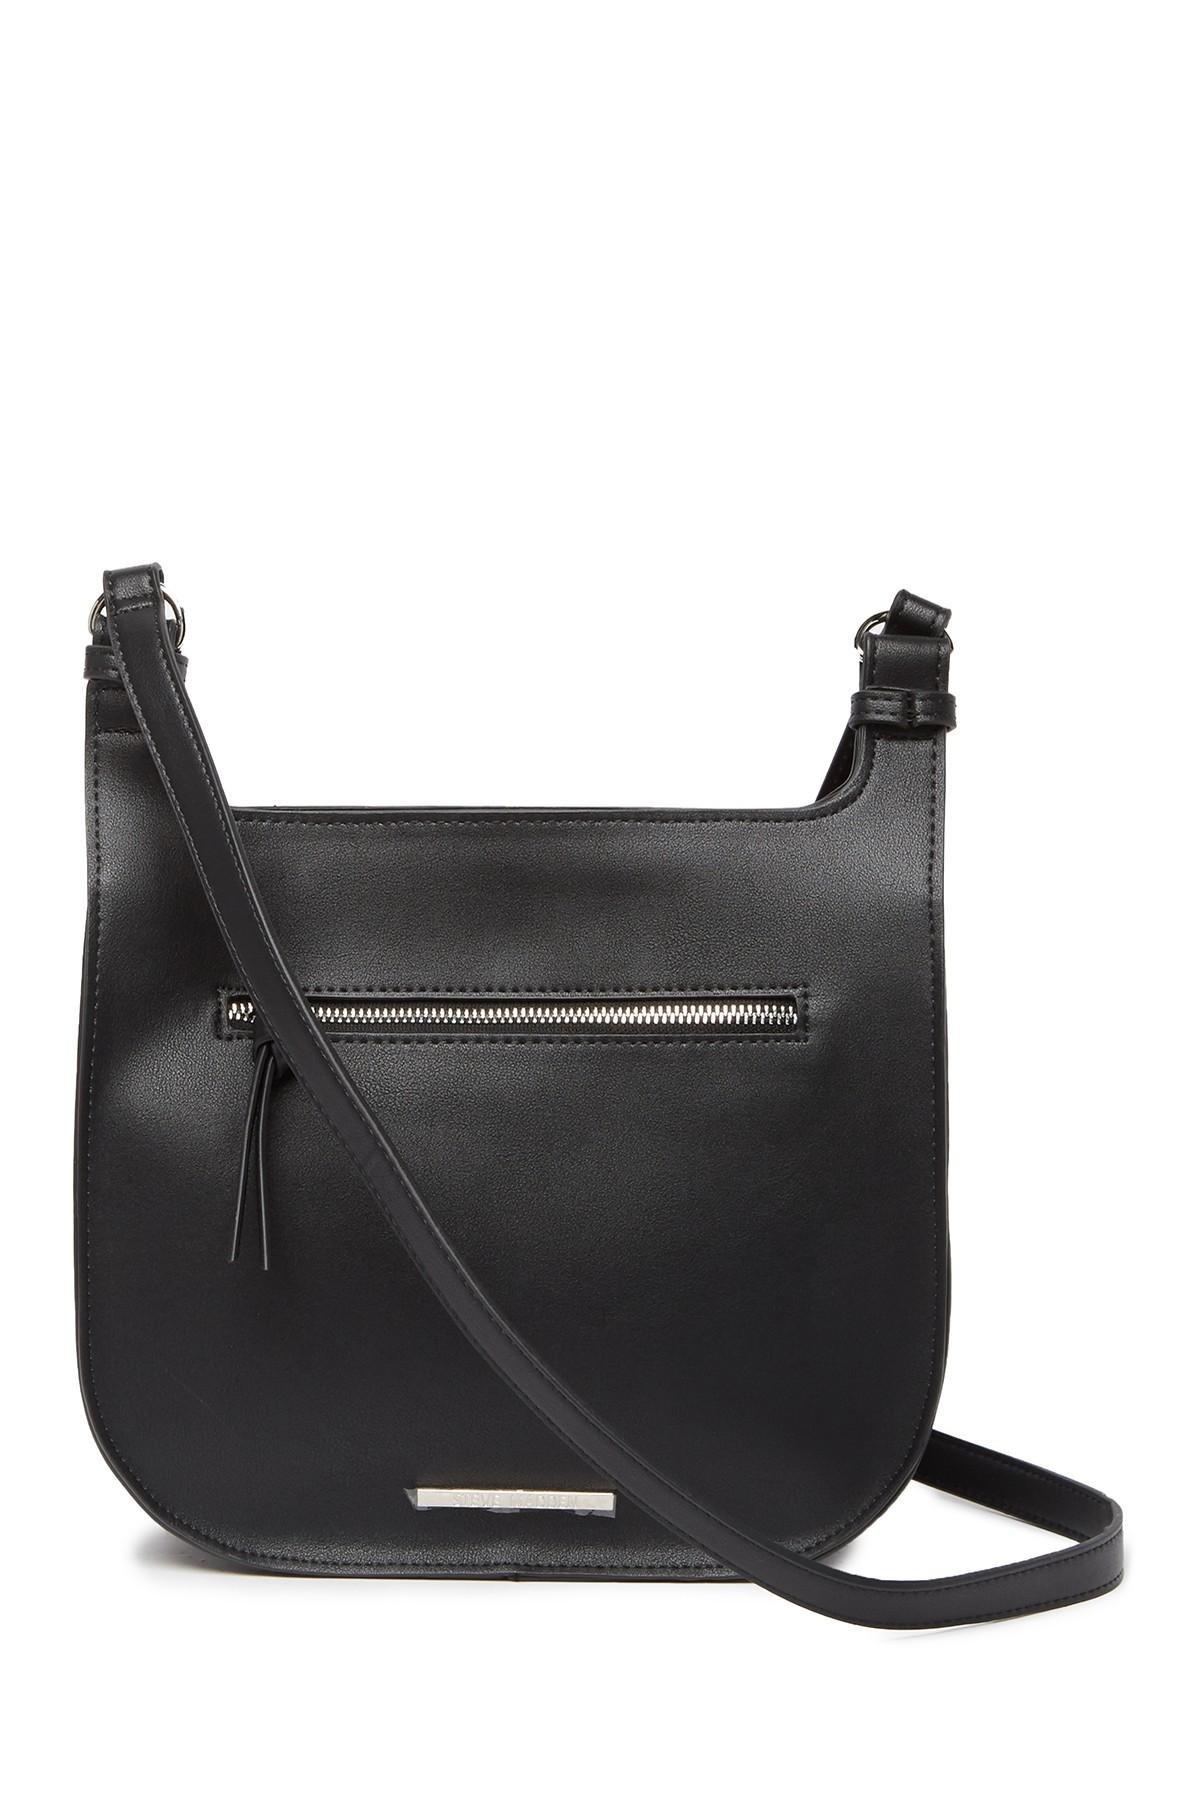 a1c9806a99 Steve Madden - Black Saddle Faux Leather Crossbody Bag - Lyst. View  fullscreen